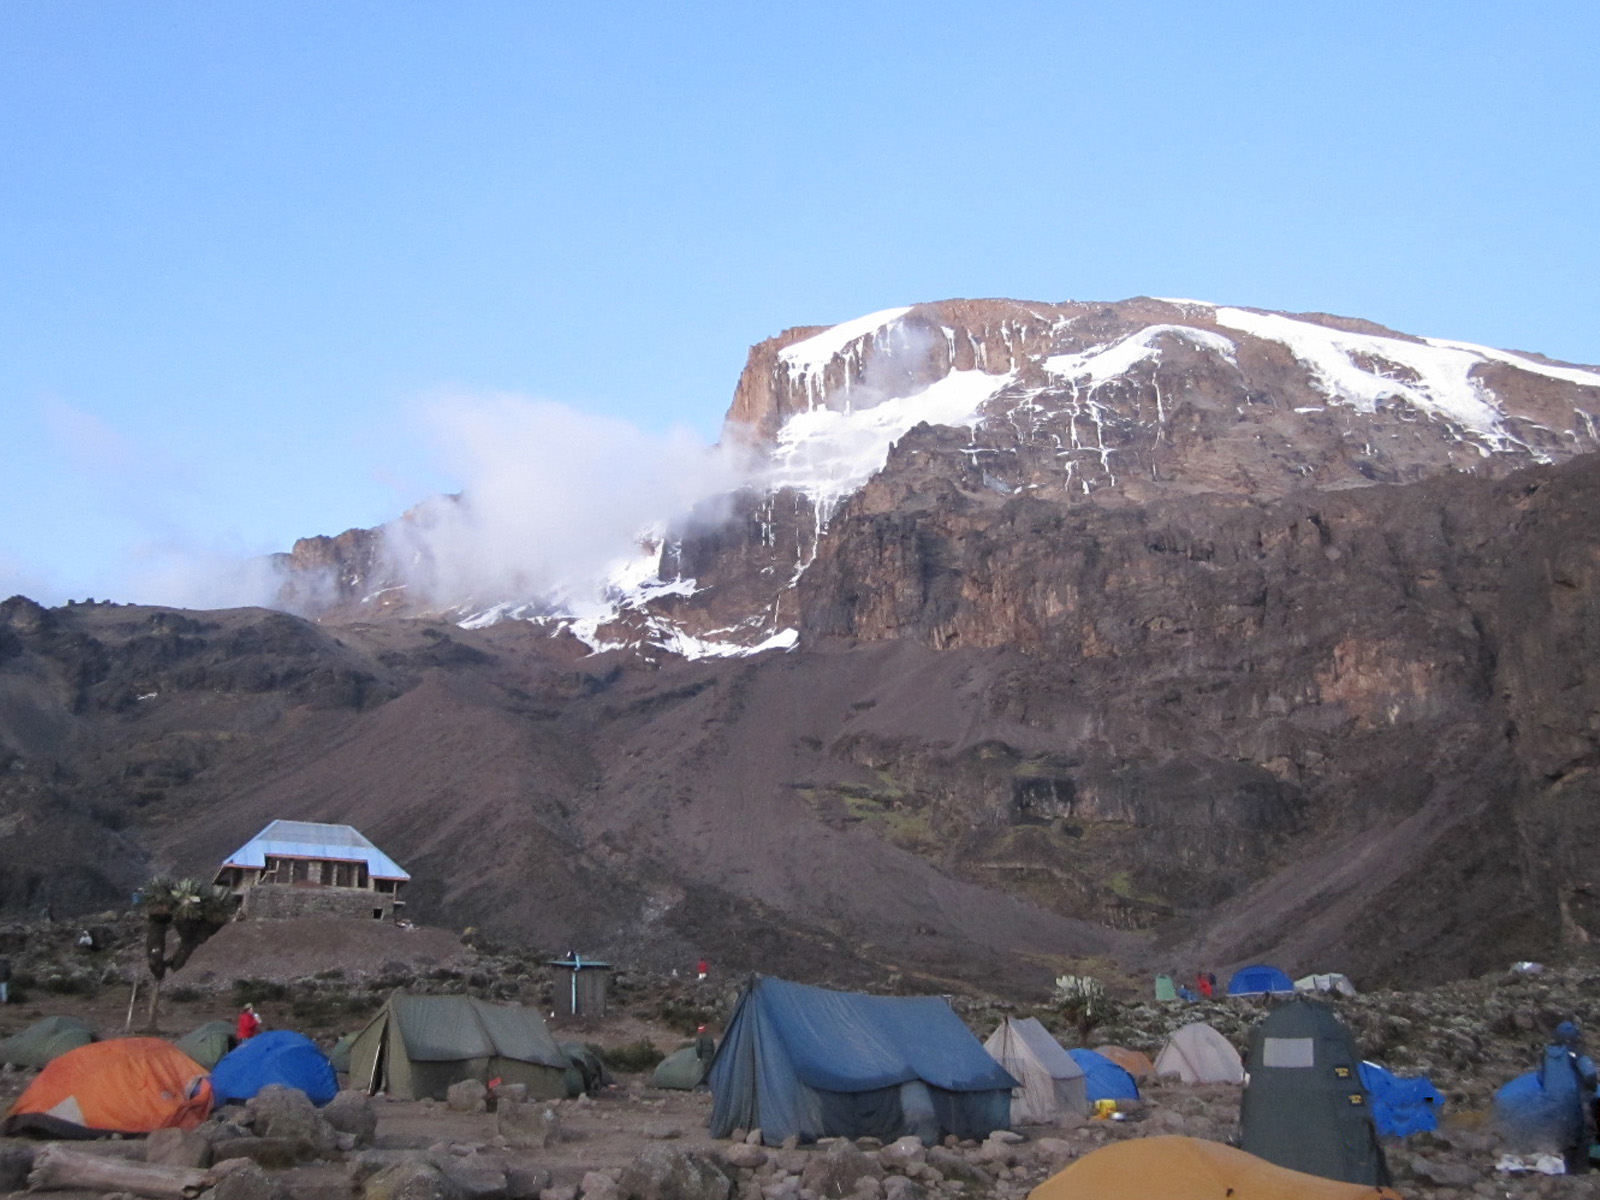 04-Barranco-Camp (1)